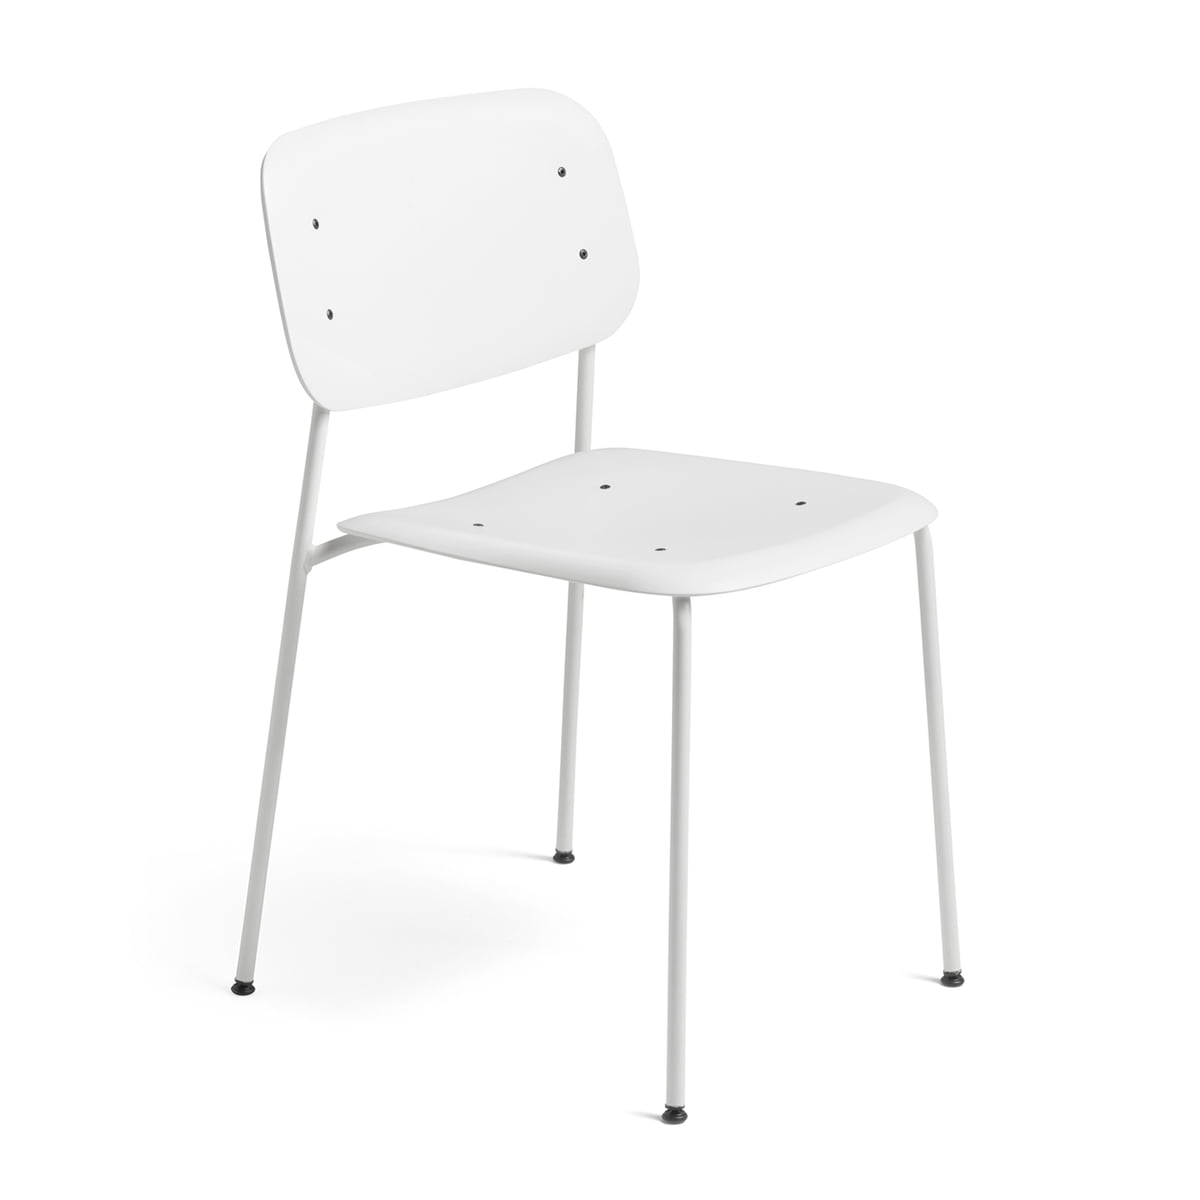 Hay   Soft Edge P10 Stuhl, Weiß